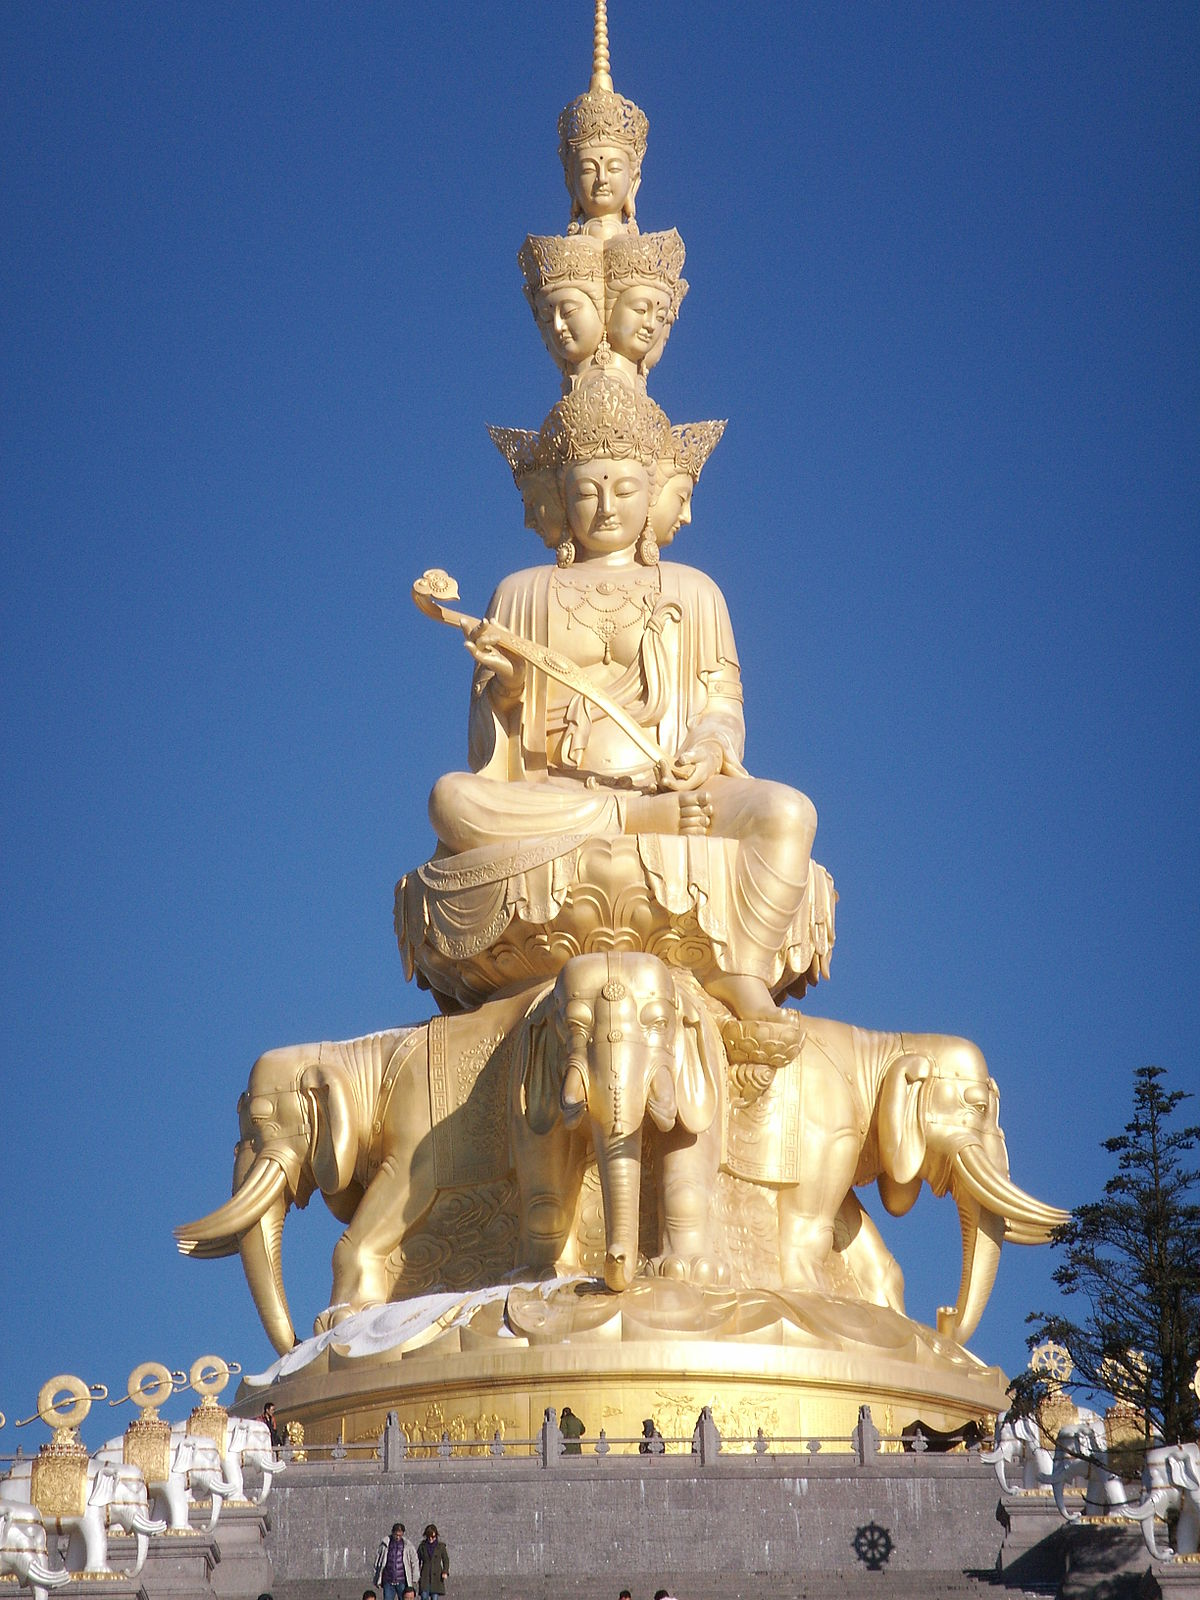 https://upload.wikimedia.org/wikipedia/commons/thumb/2/2c/Massive_golden_buddha_on_the_sumit_of_Eimei_Shan.jpg/1200px-Massive_golden_buddha_on_the_sumit_of_Eimei_Shan.jpg